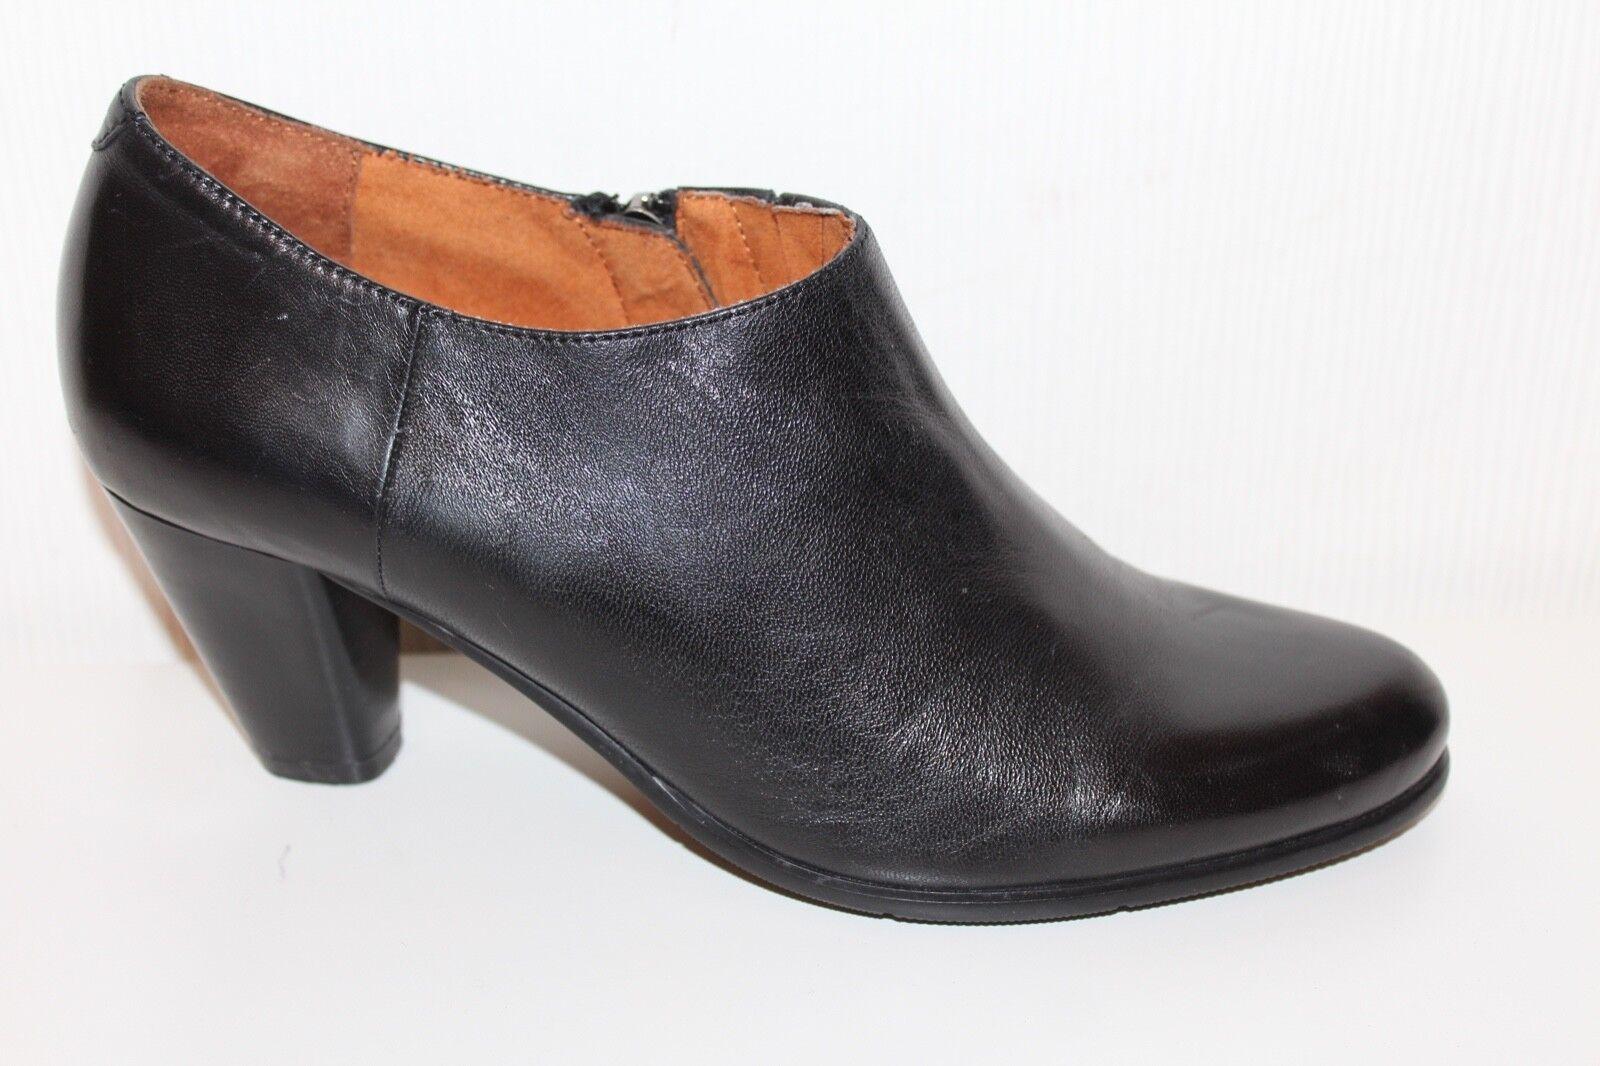 Zanon & Zago Zago Zago cuir bottines bottes Chelsea Pistol démarrageies 40 Bottines Chaussures 7fa6cd